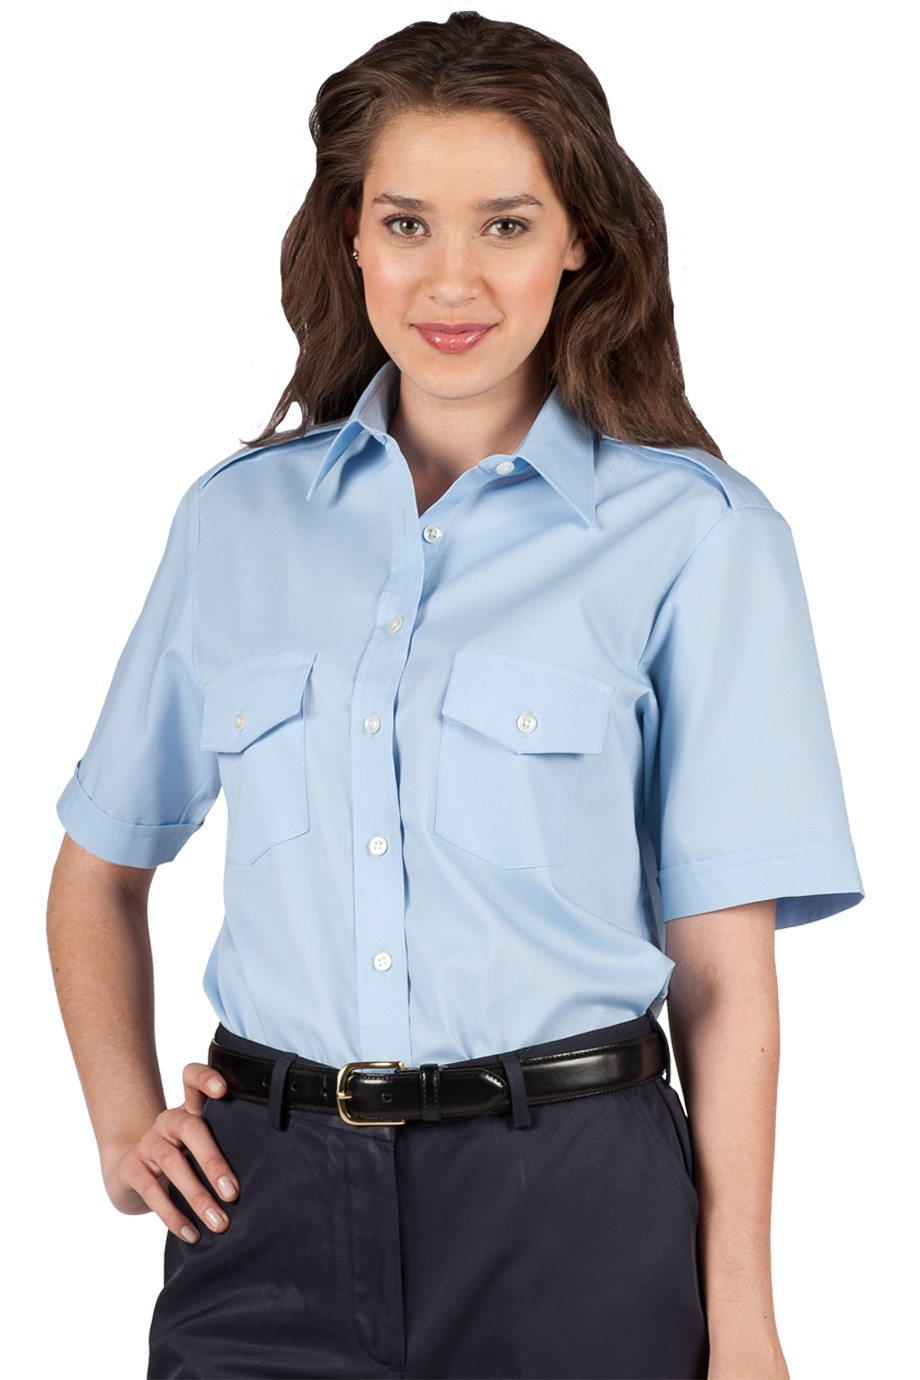 Edwards Garment 5212 - W Short Sleeve Navigator